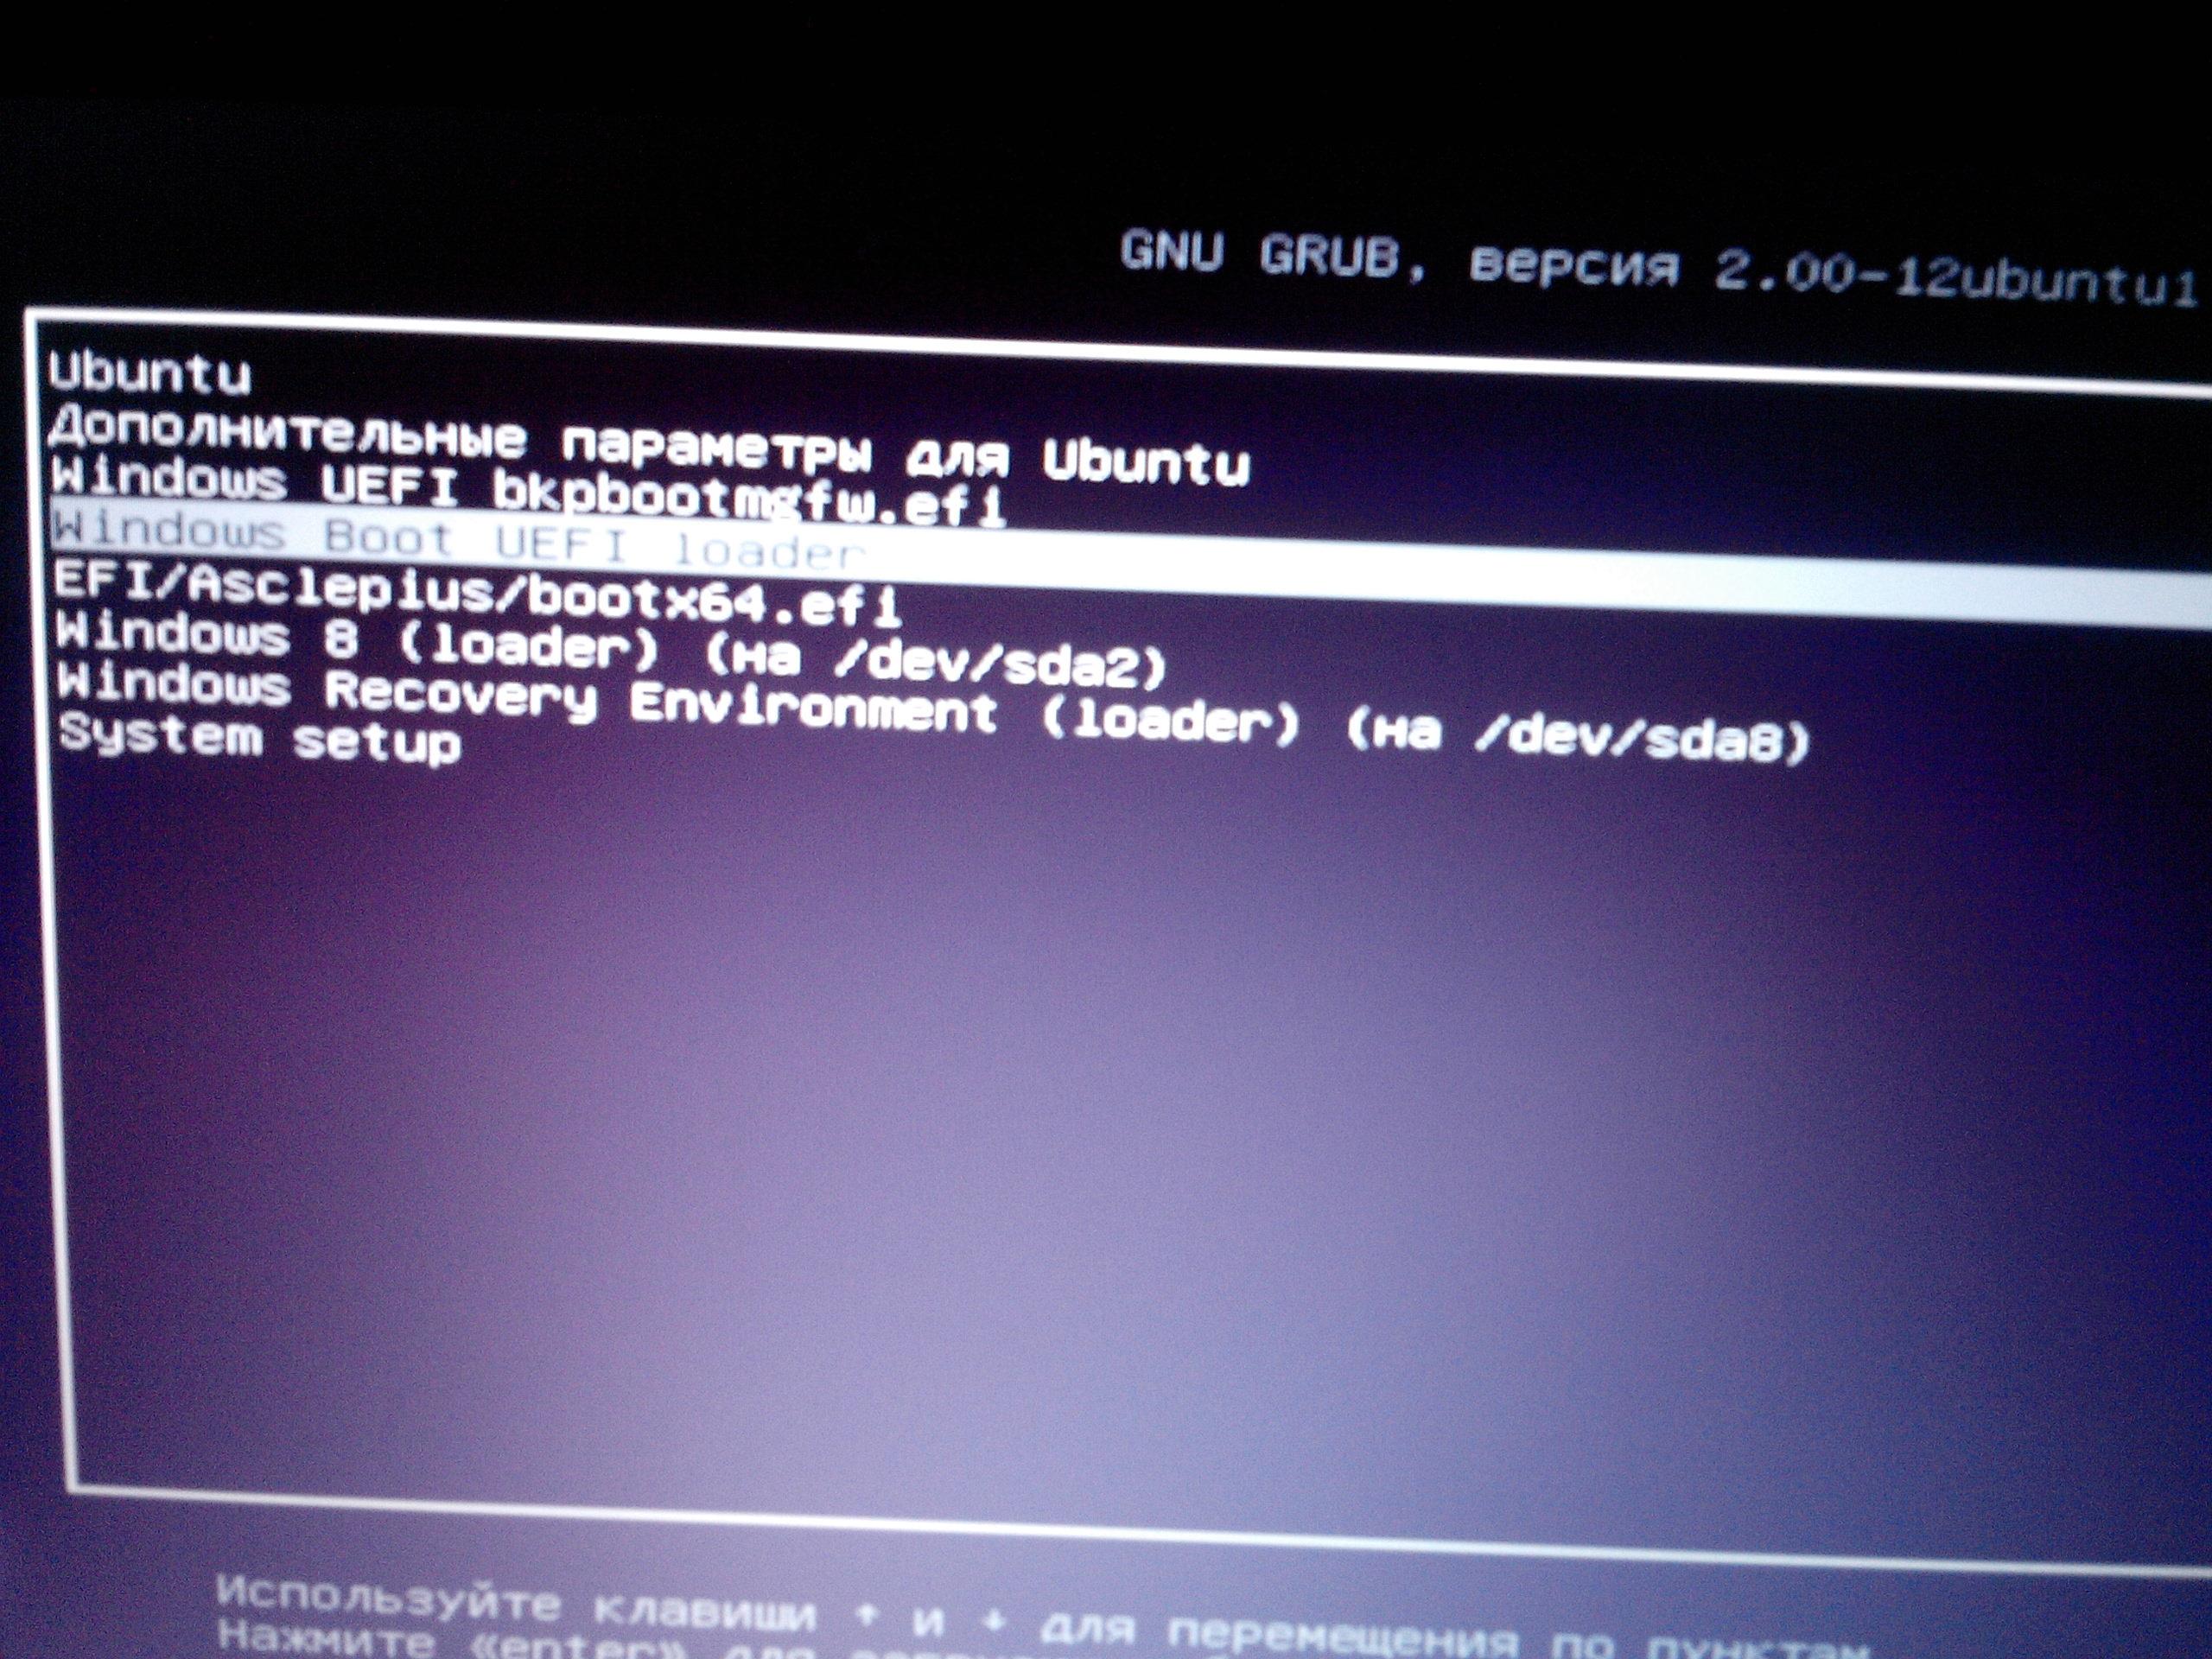 Tutorial insatalasi linux ubuntu 1404 dan windows 7 (dual boot)